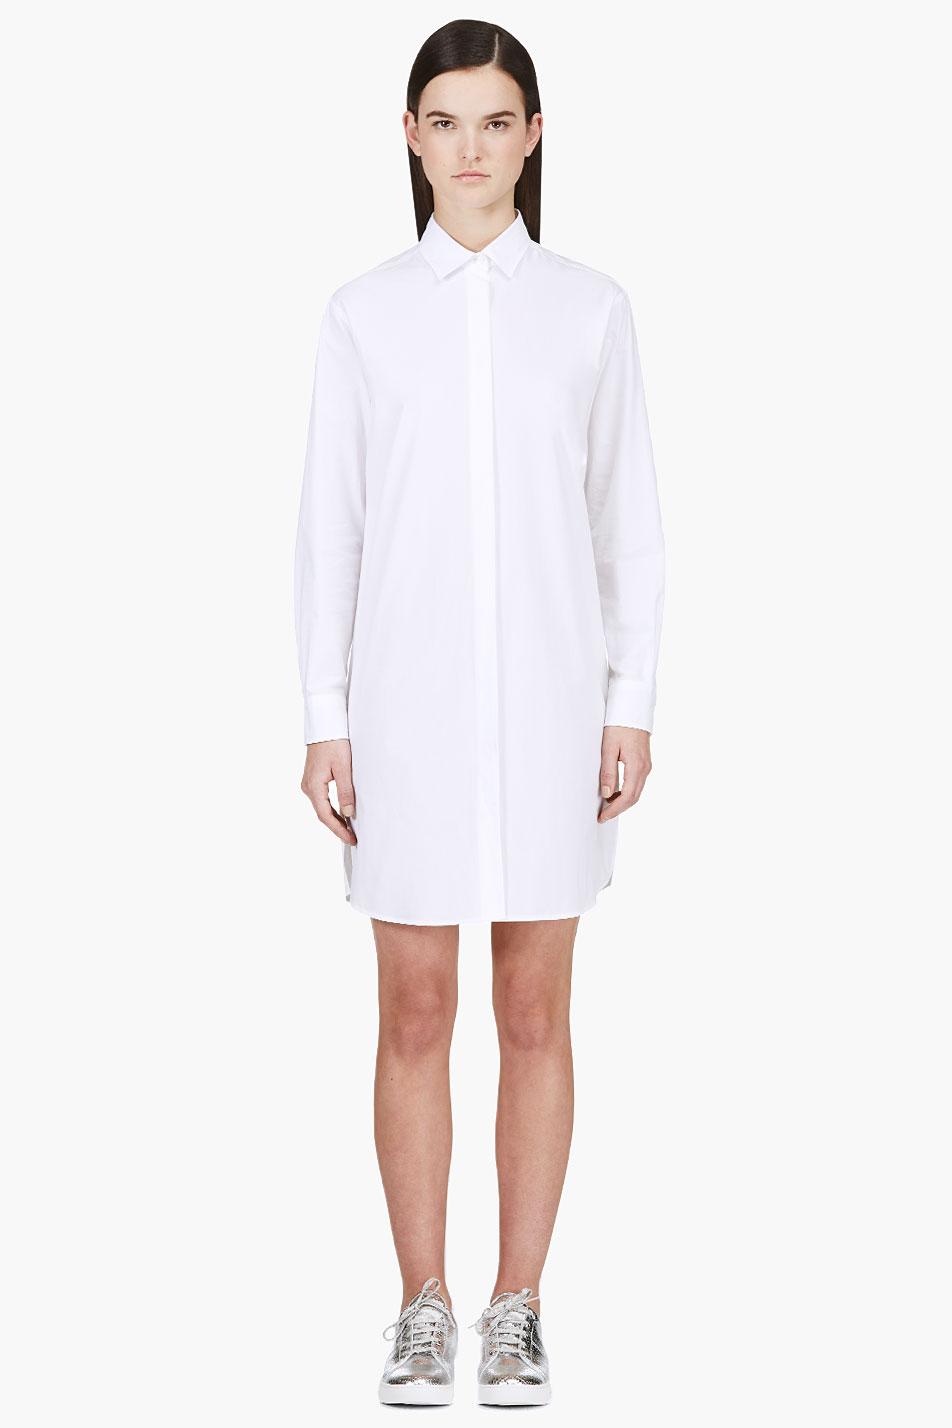 Msgm White Classic Shirt Dress